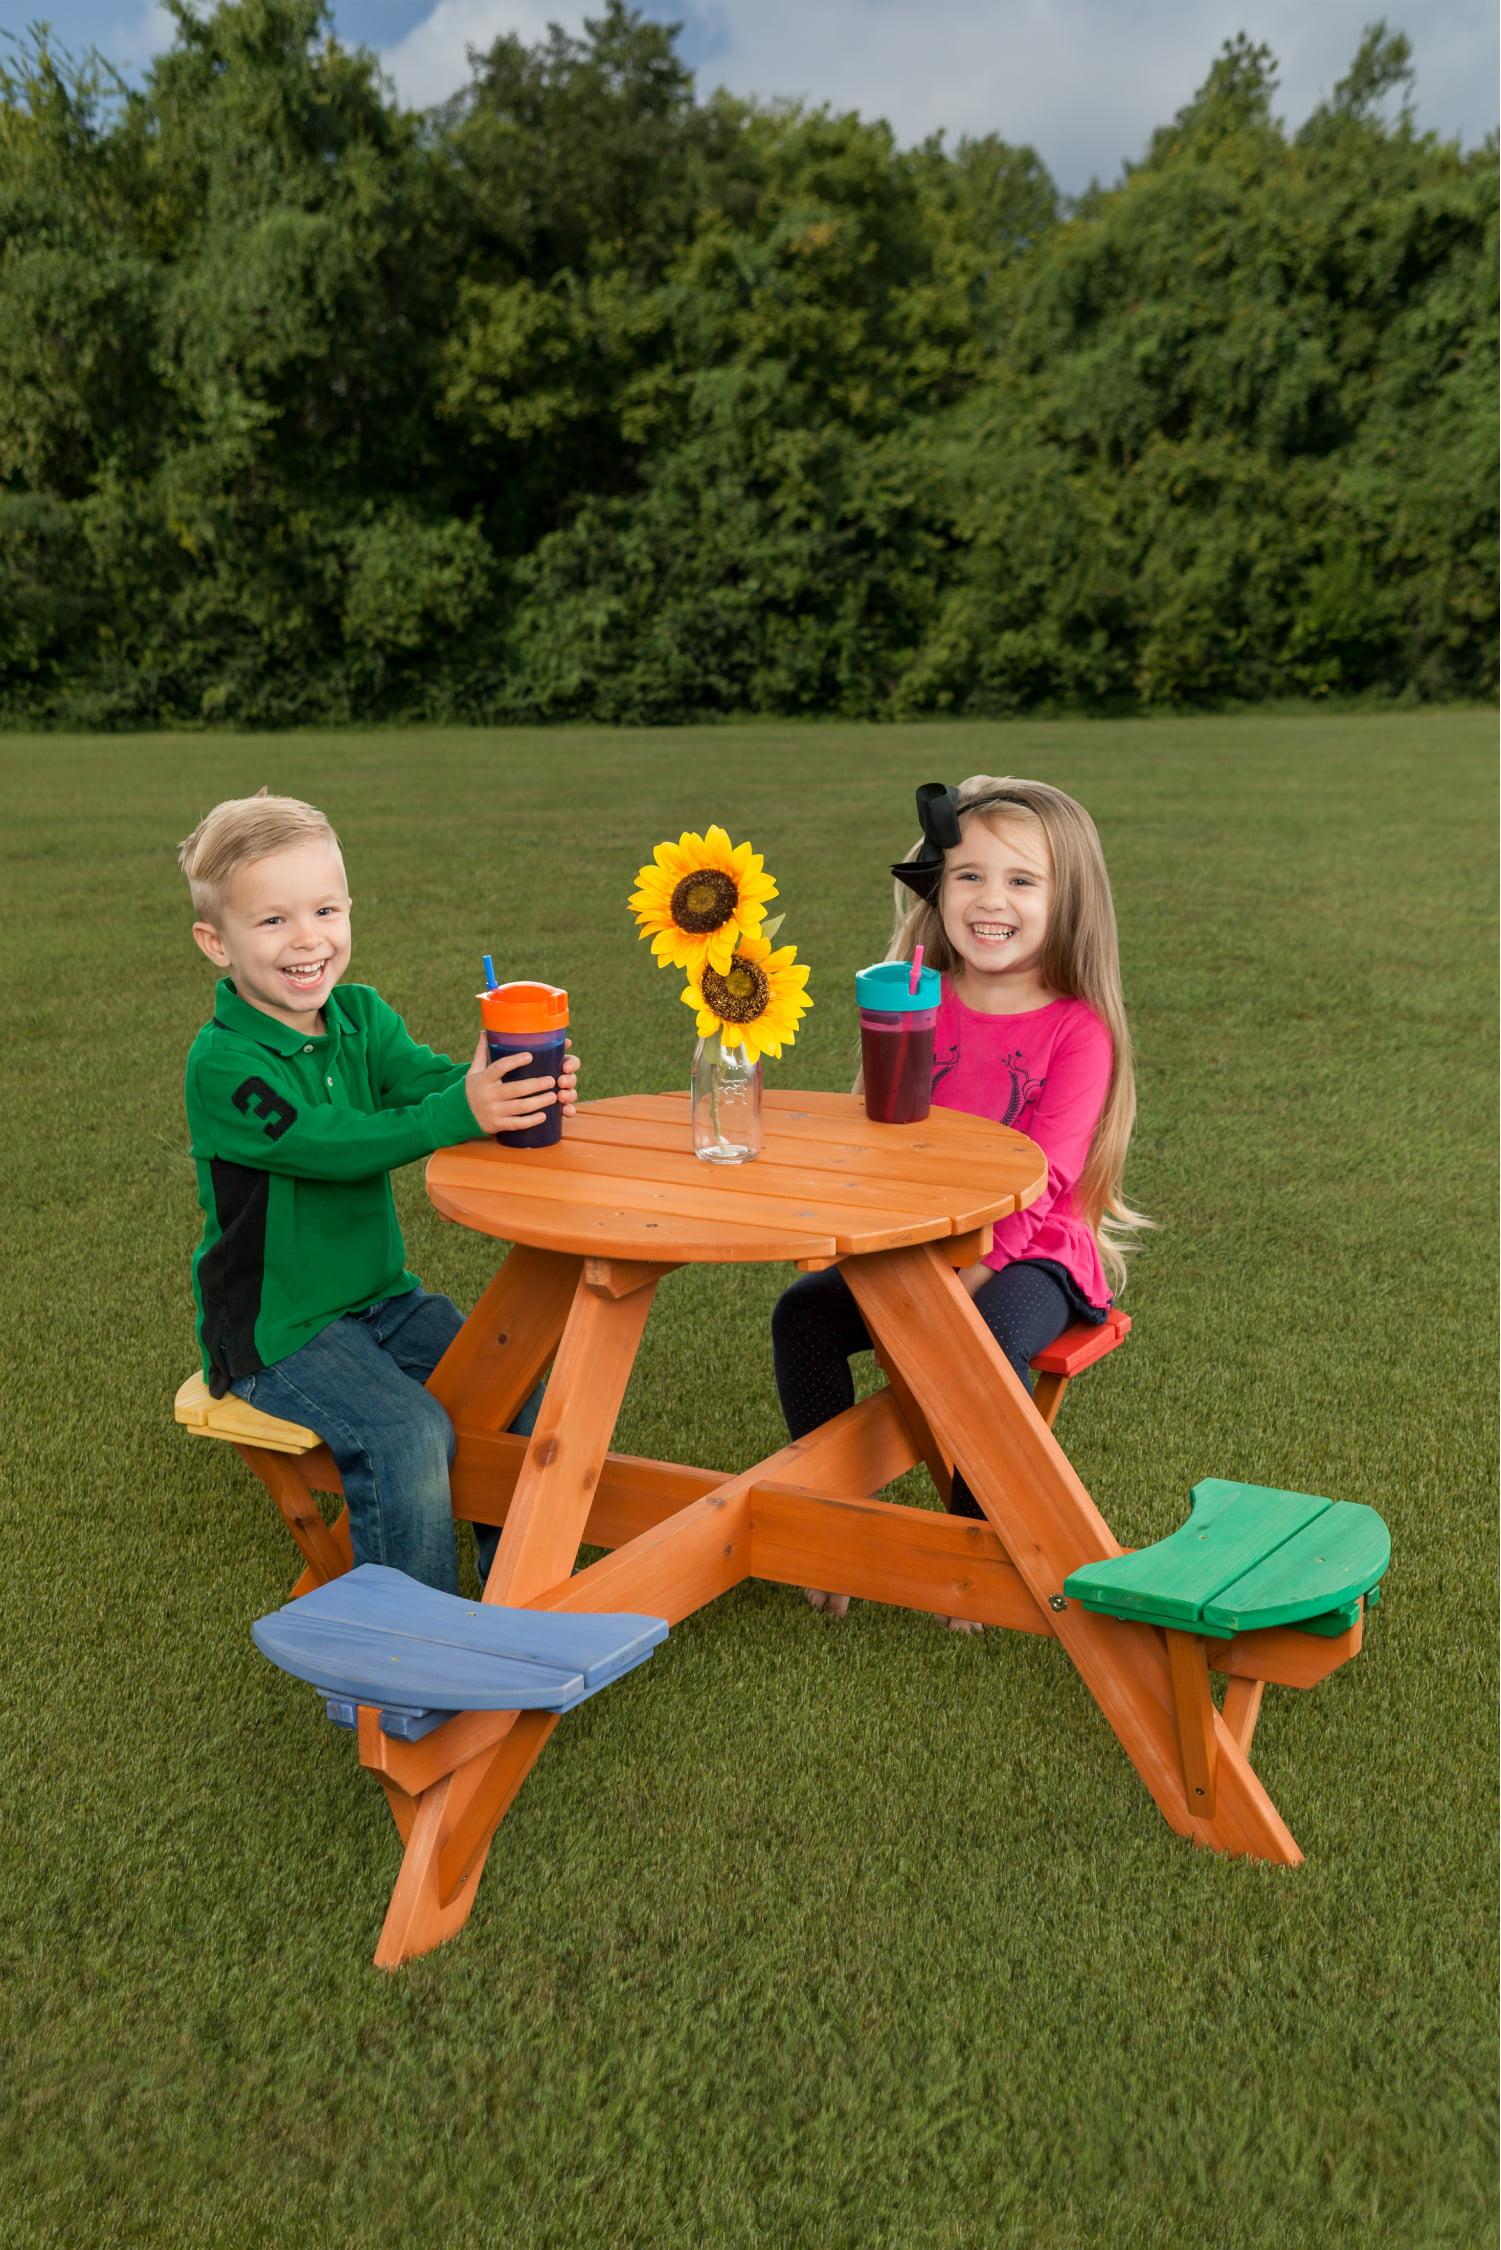 Children's Round Wooden Picnic Table w  Multicolor Seats by Creative Cedar Designs